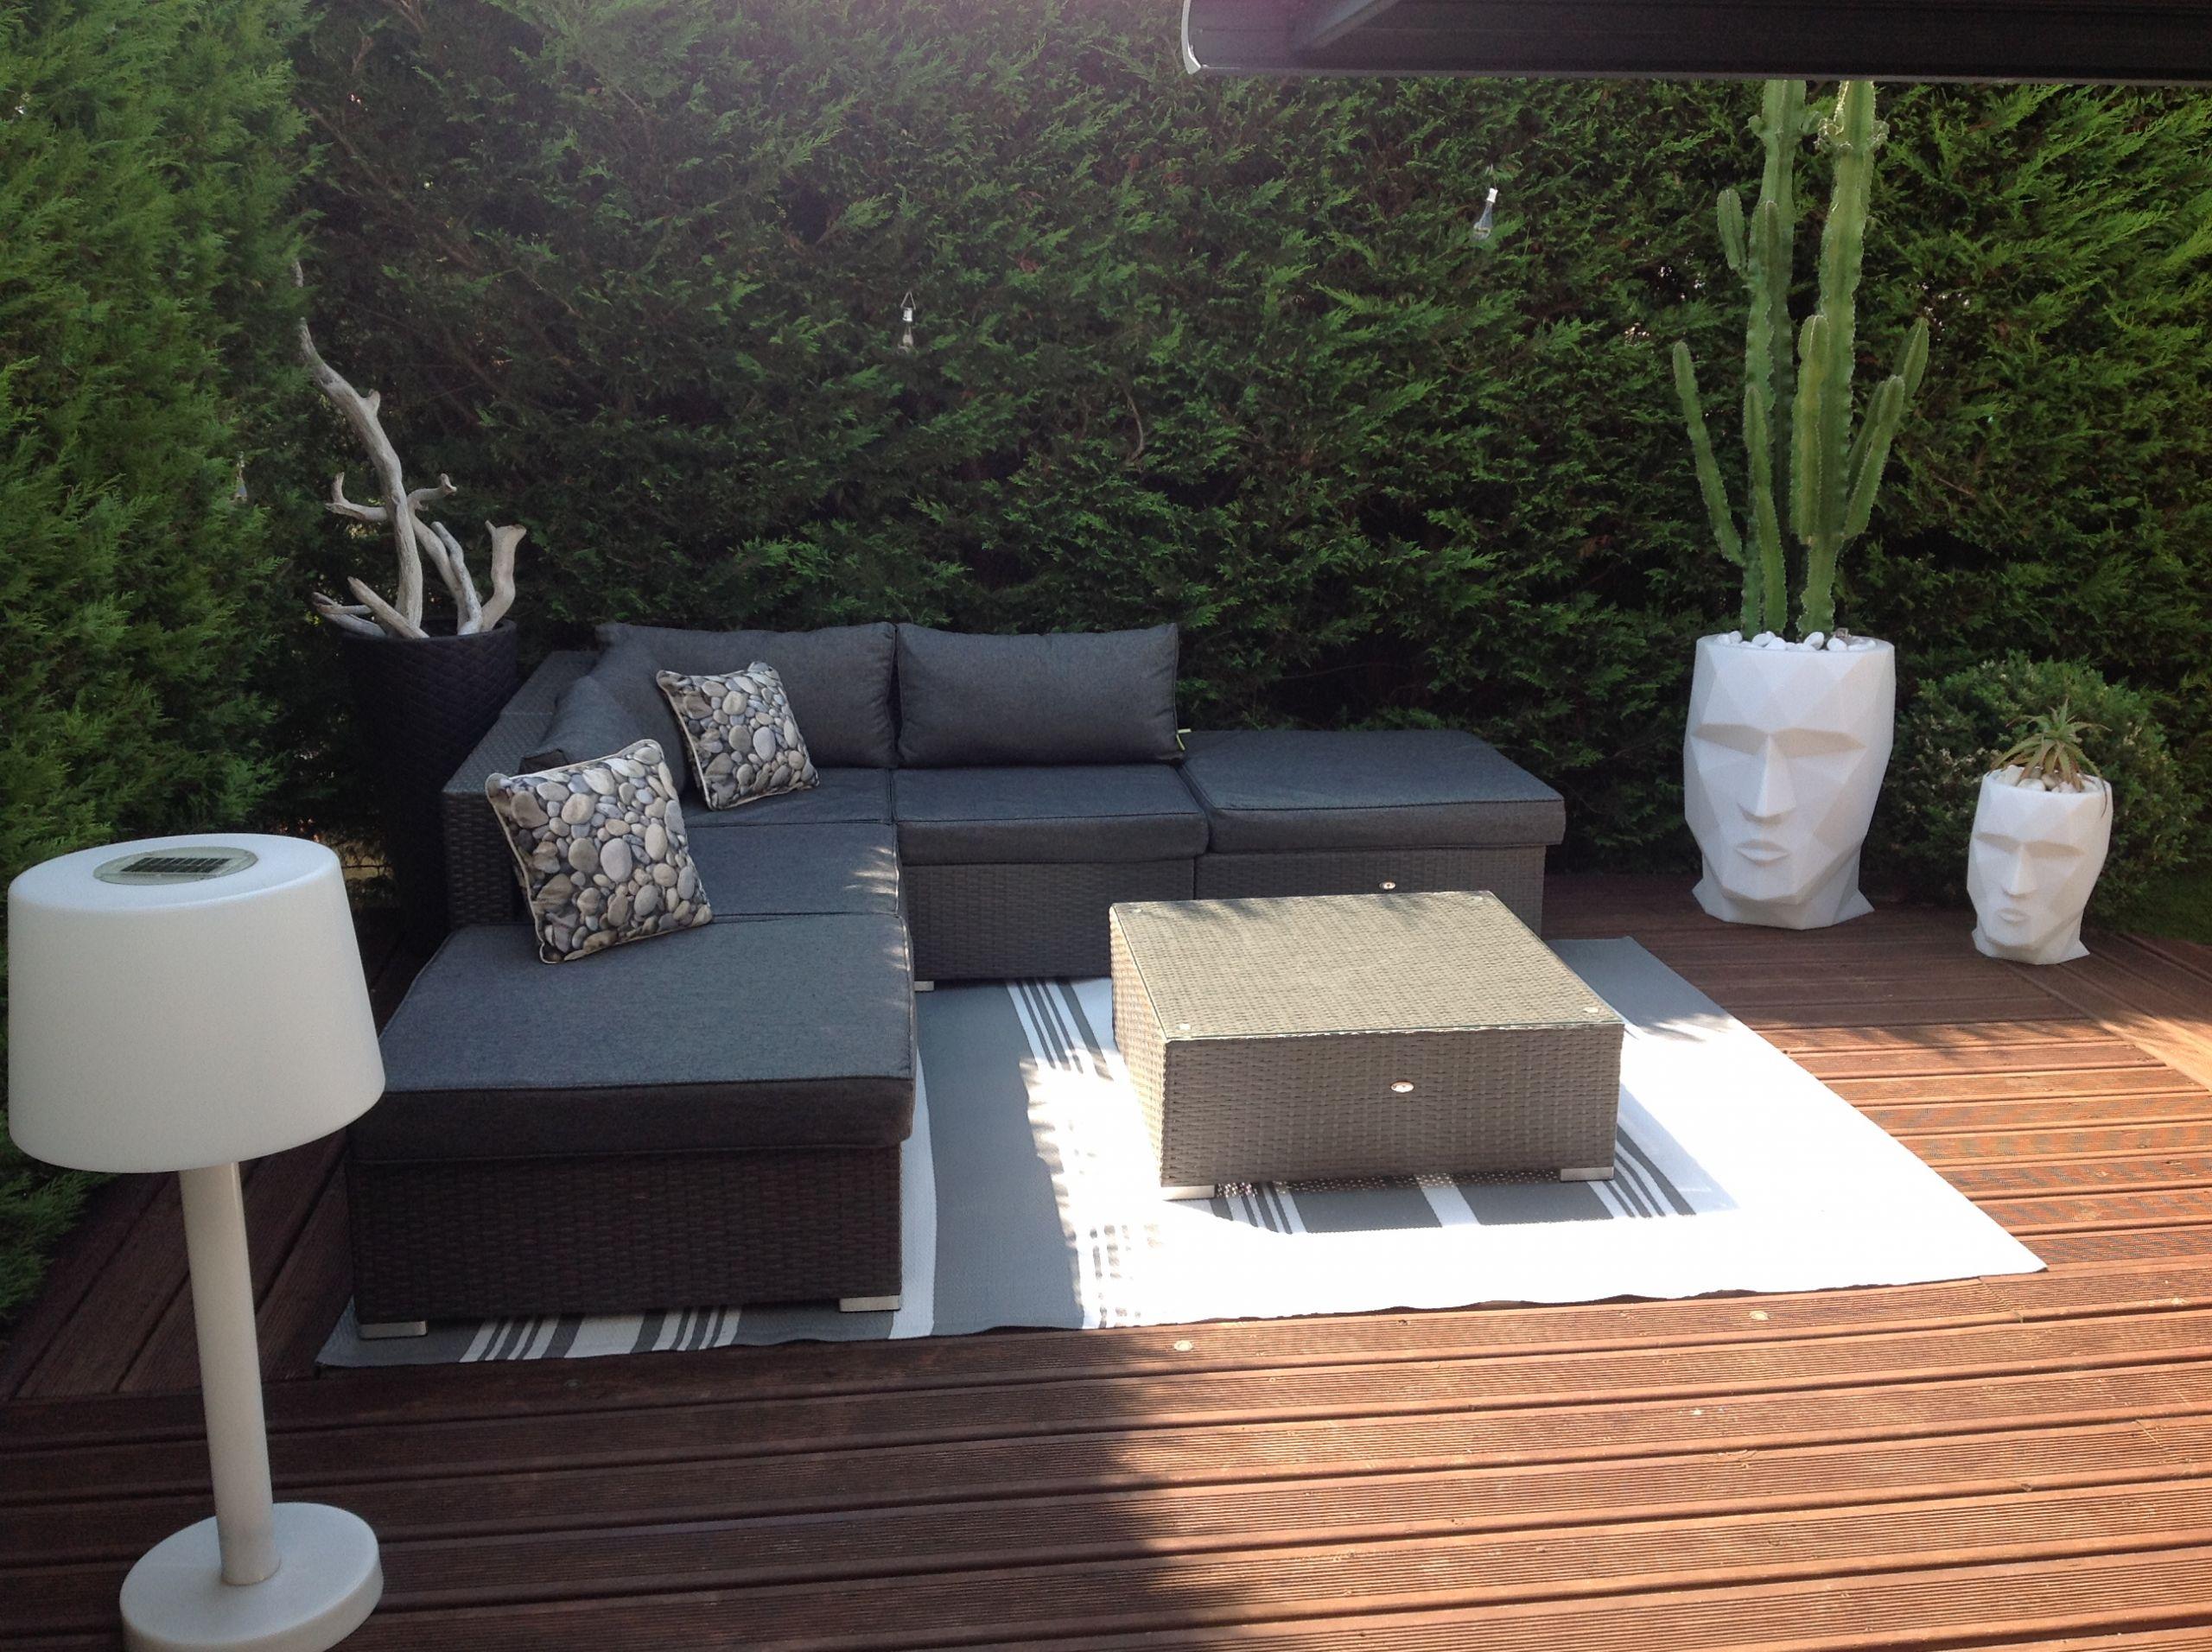 Salon De Jardin En Rotin Naturel Génial Salon Exterieur Terrasse